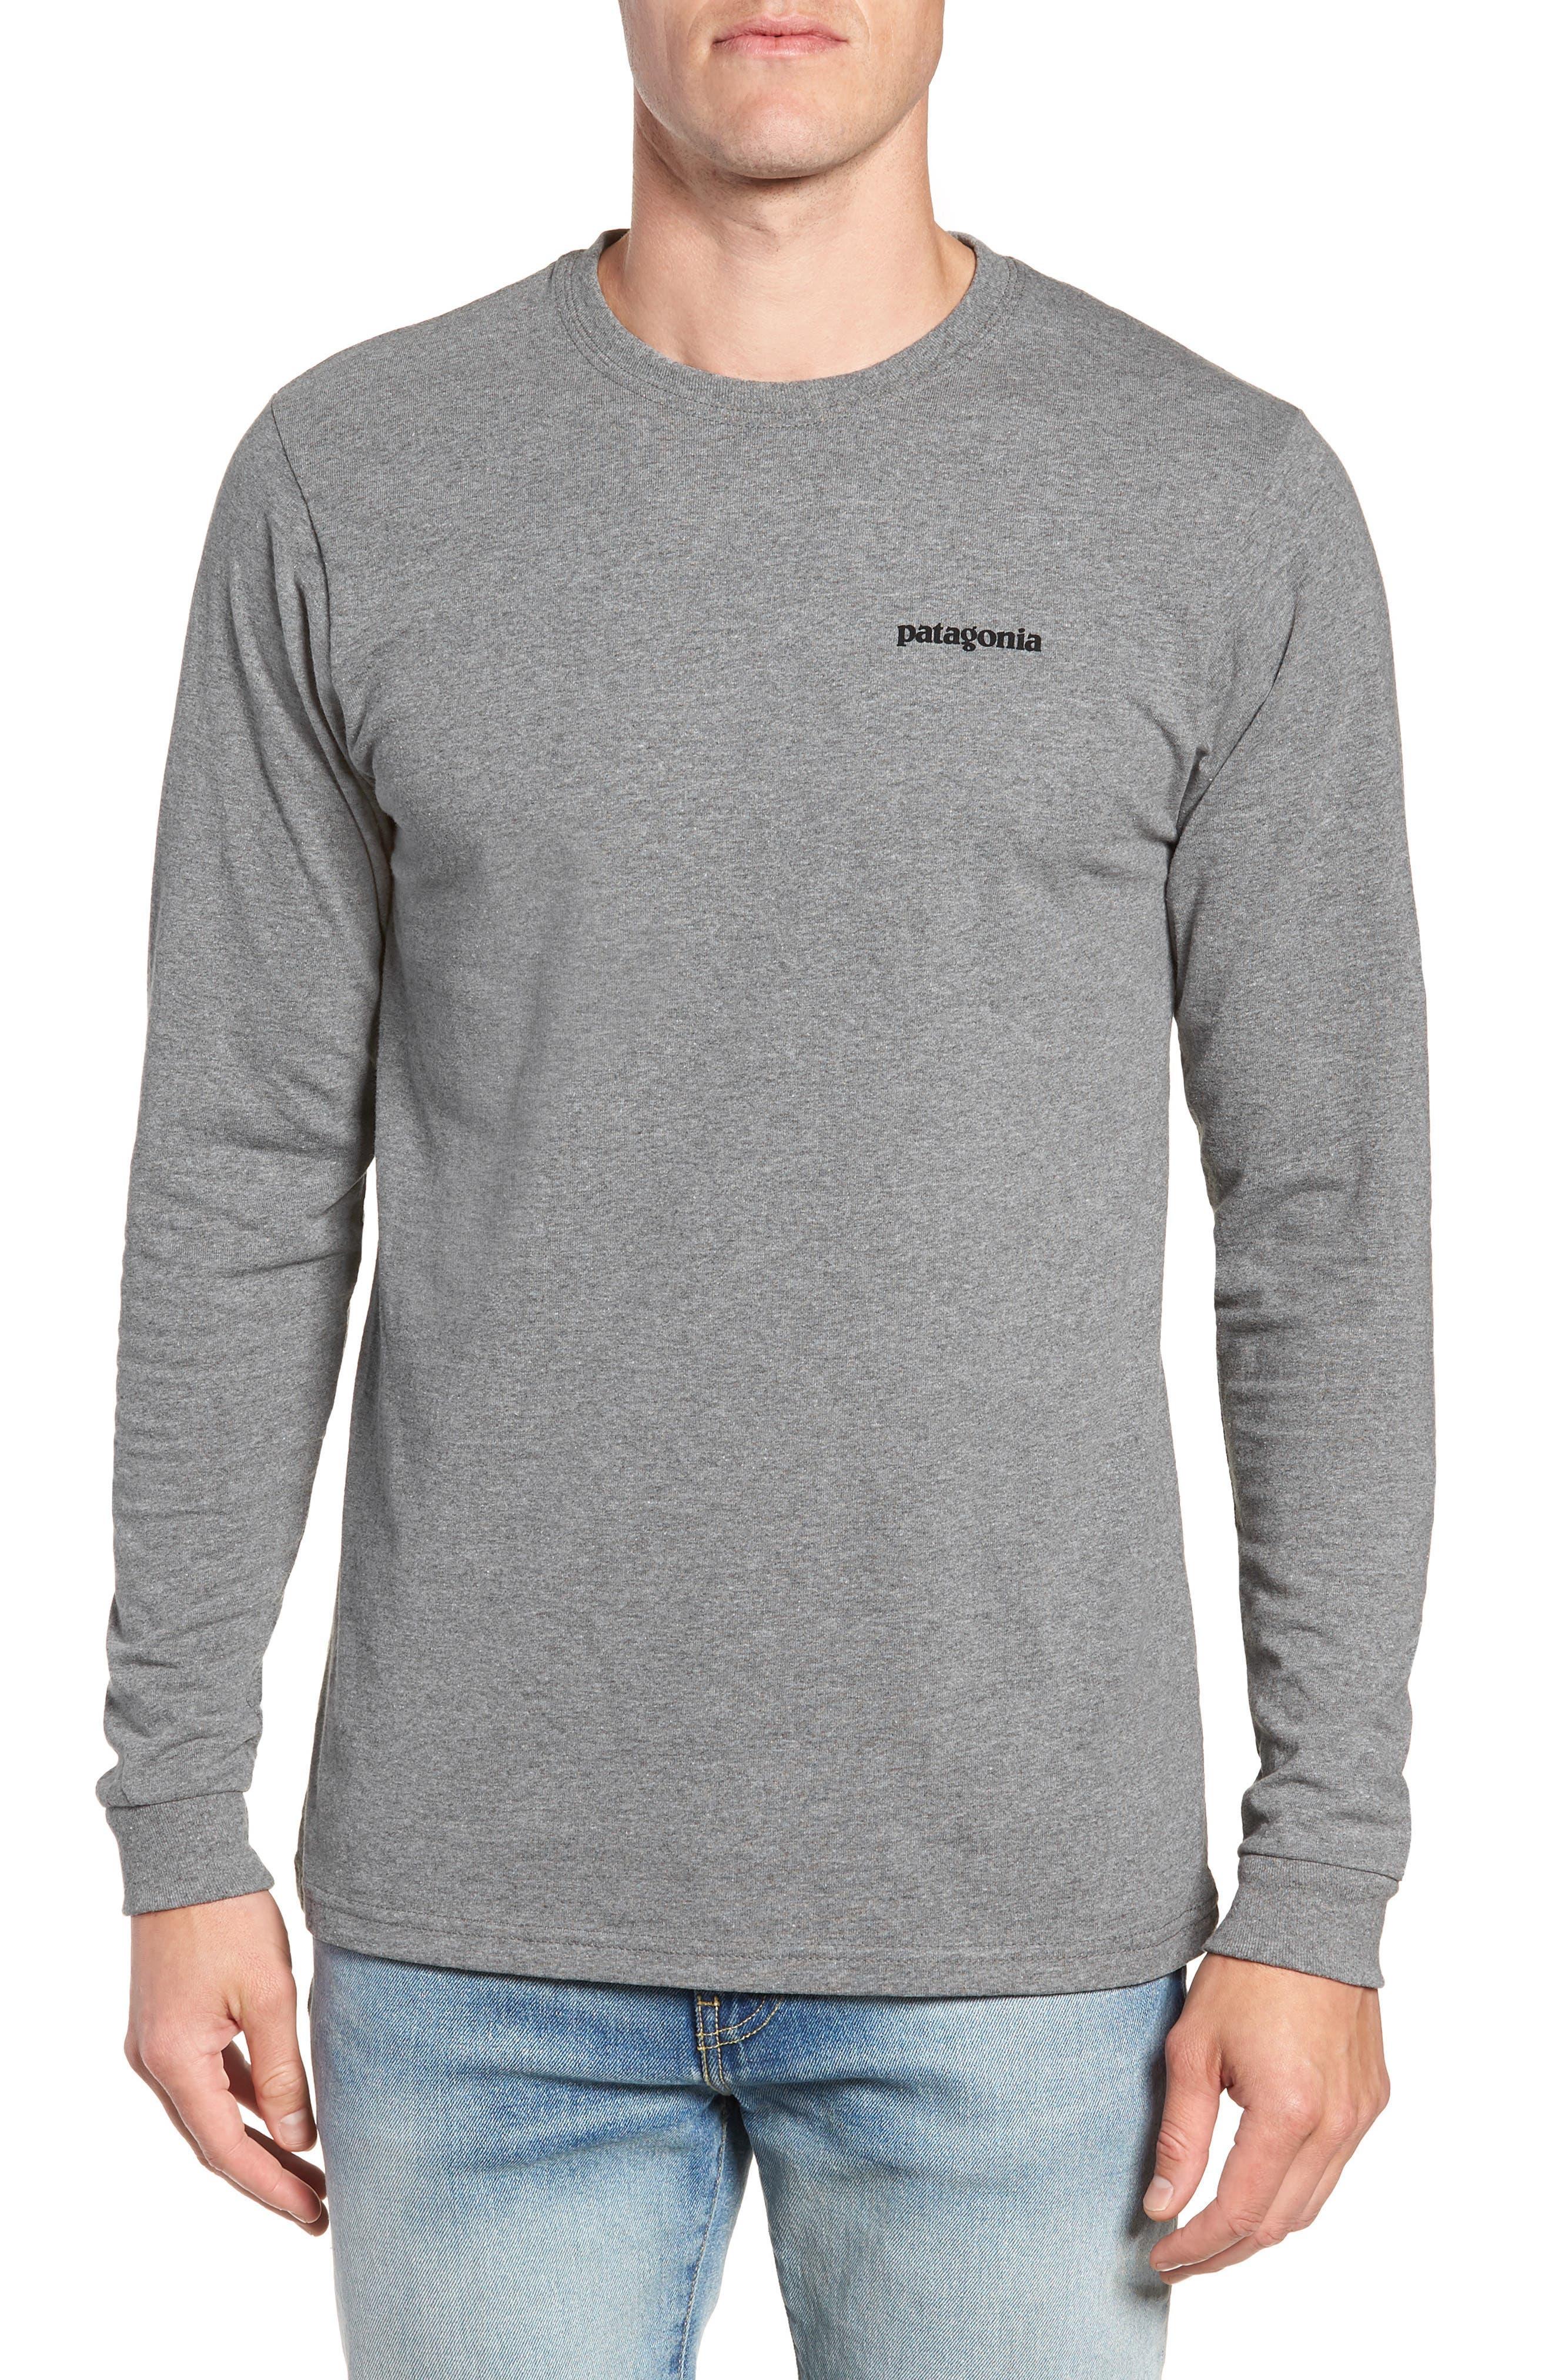 Fitz Roy Responsibili Tee Long Sleeve T Shirt by Patagonia